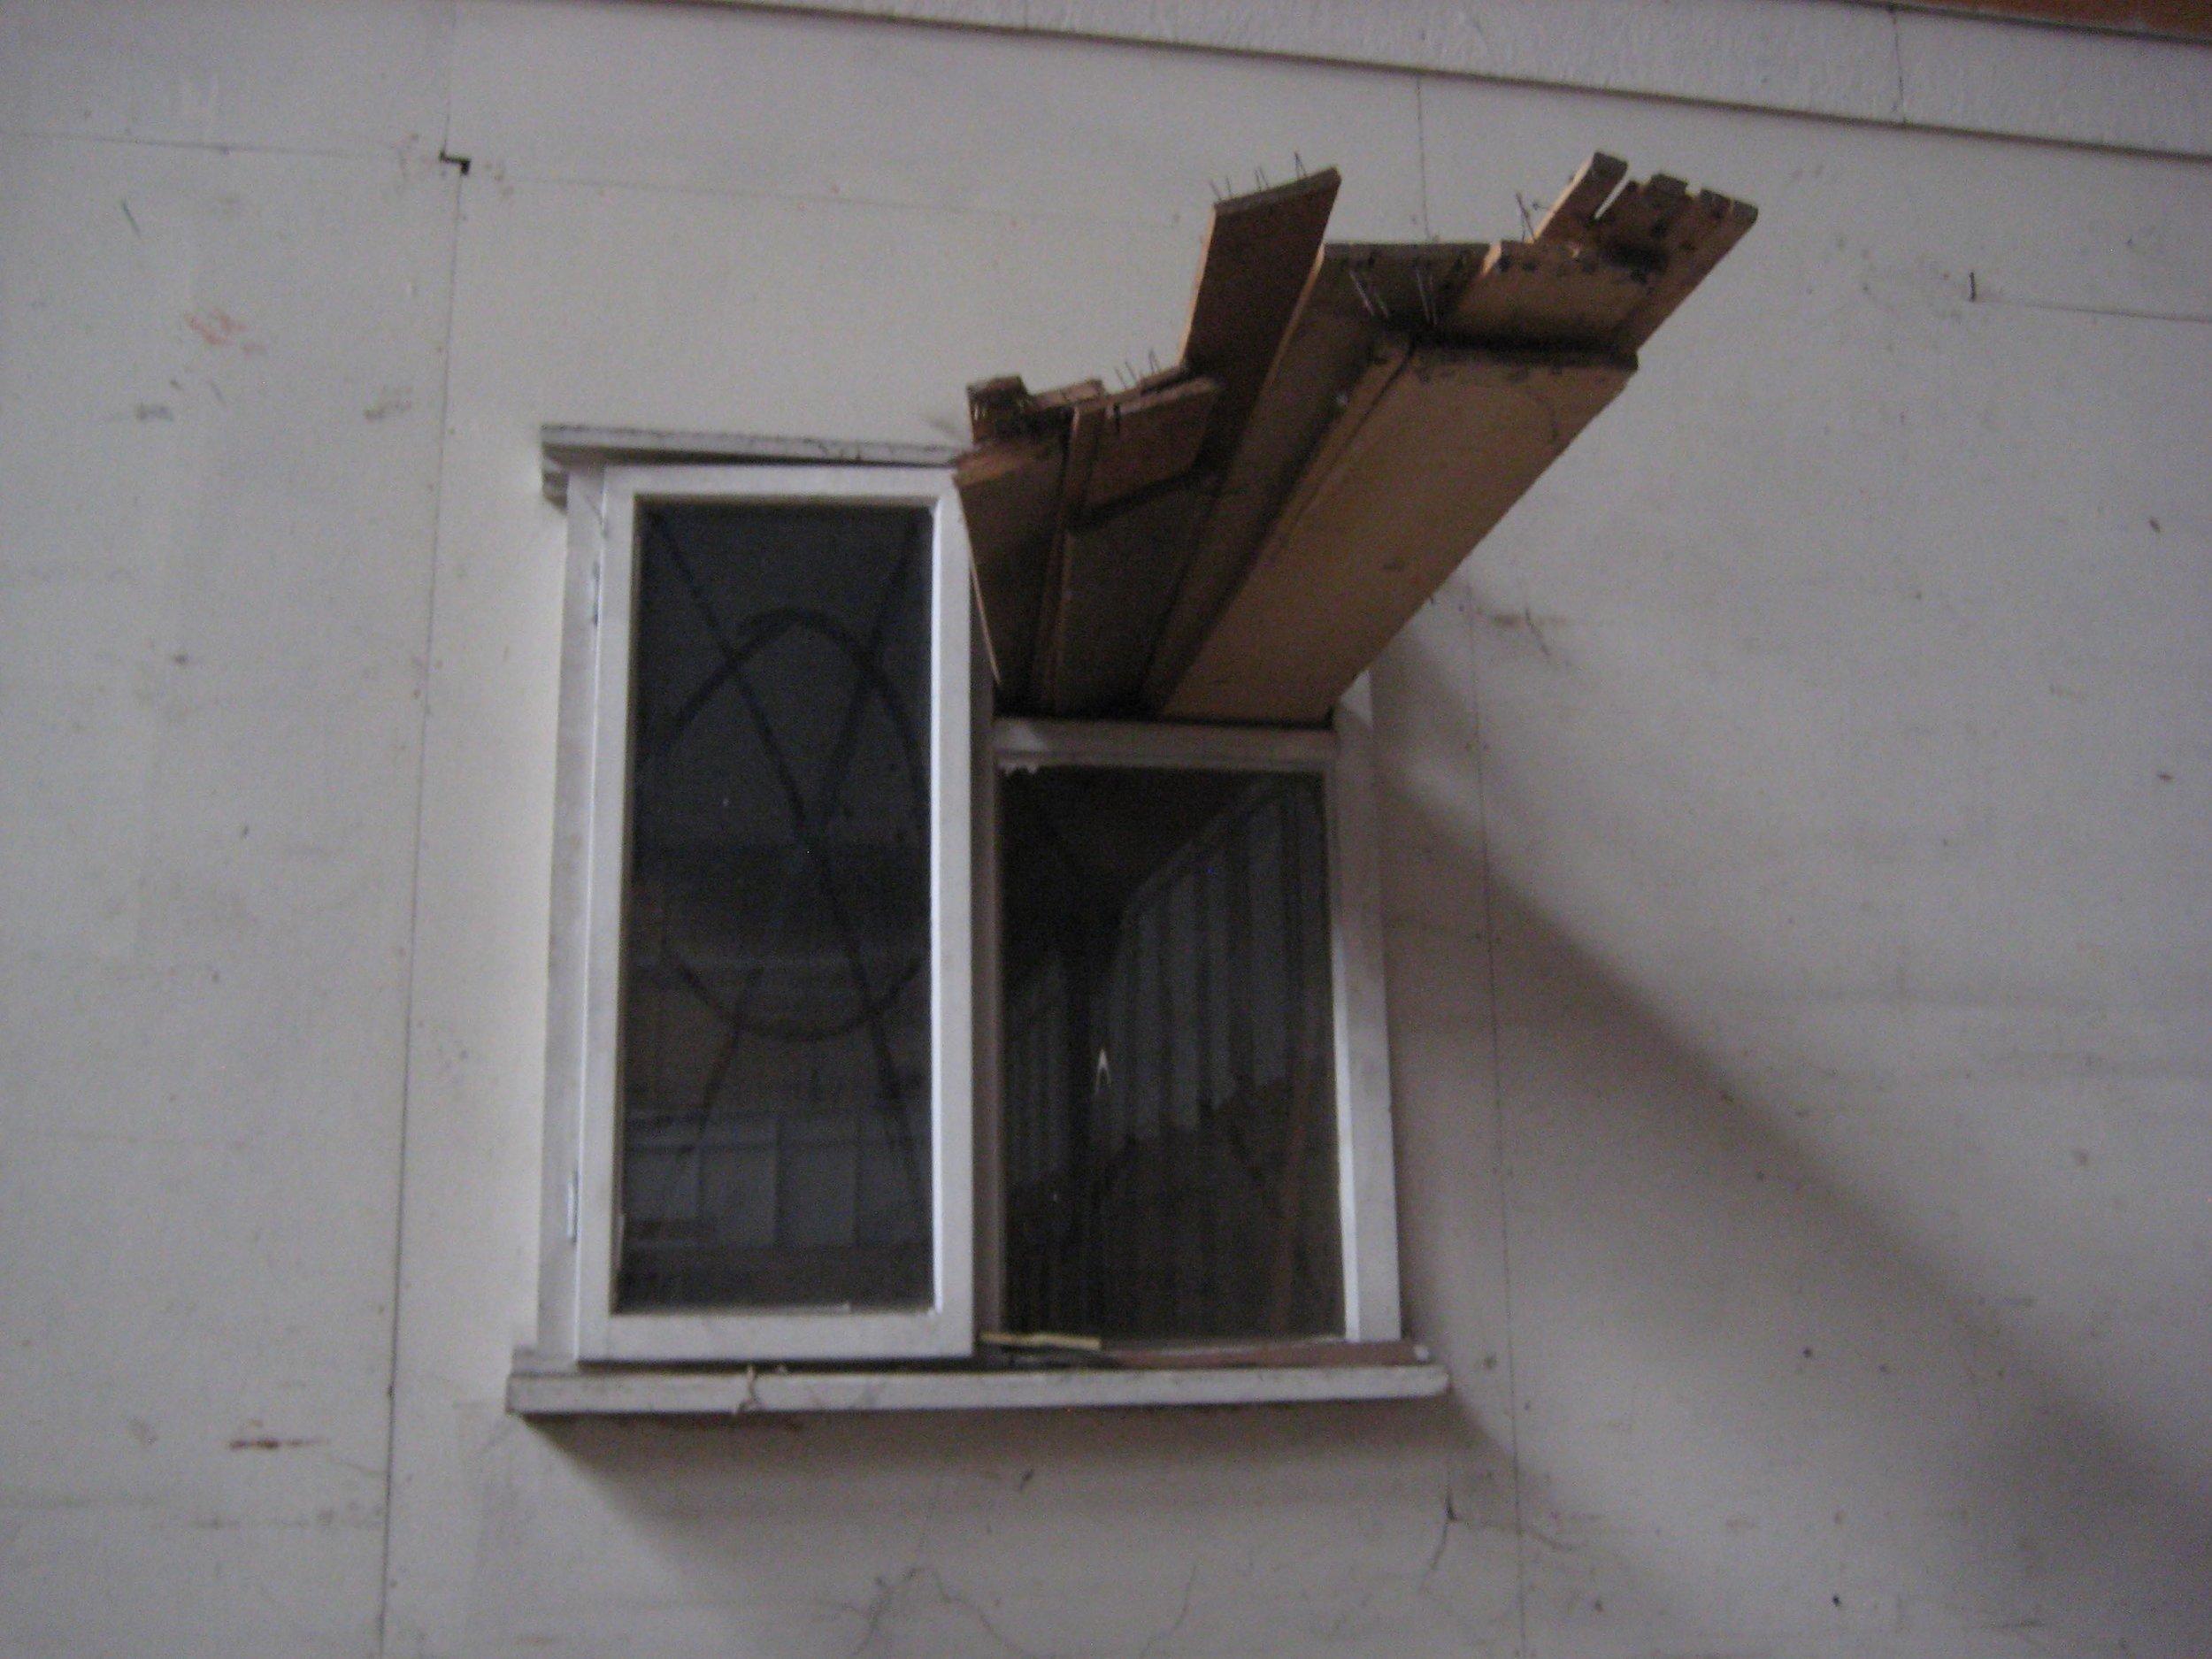 VIII Window wedge 1 (with symbol).jpg